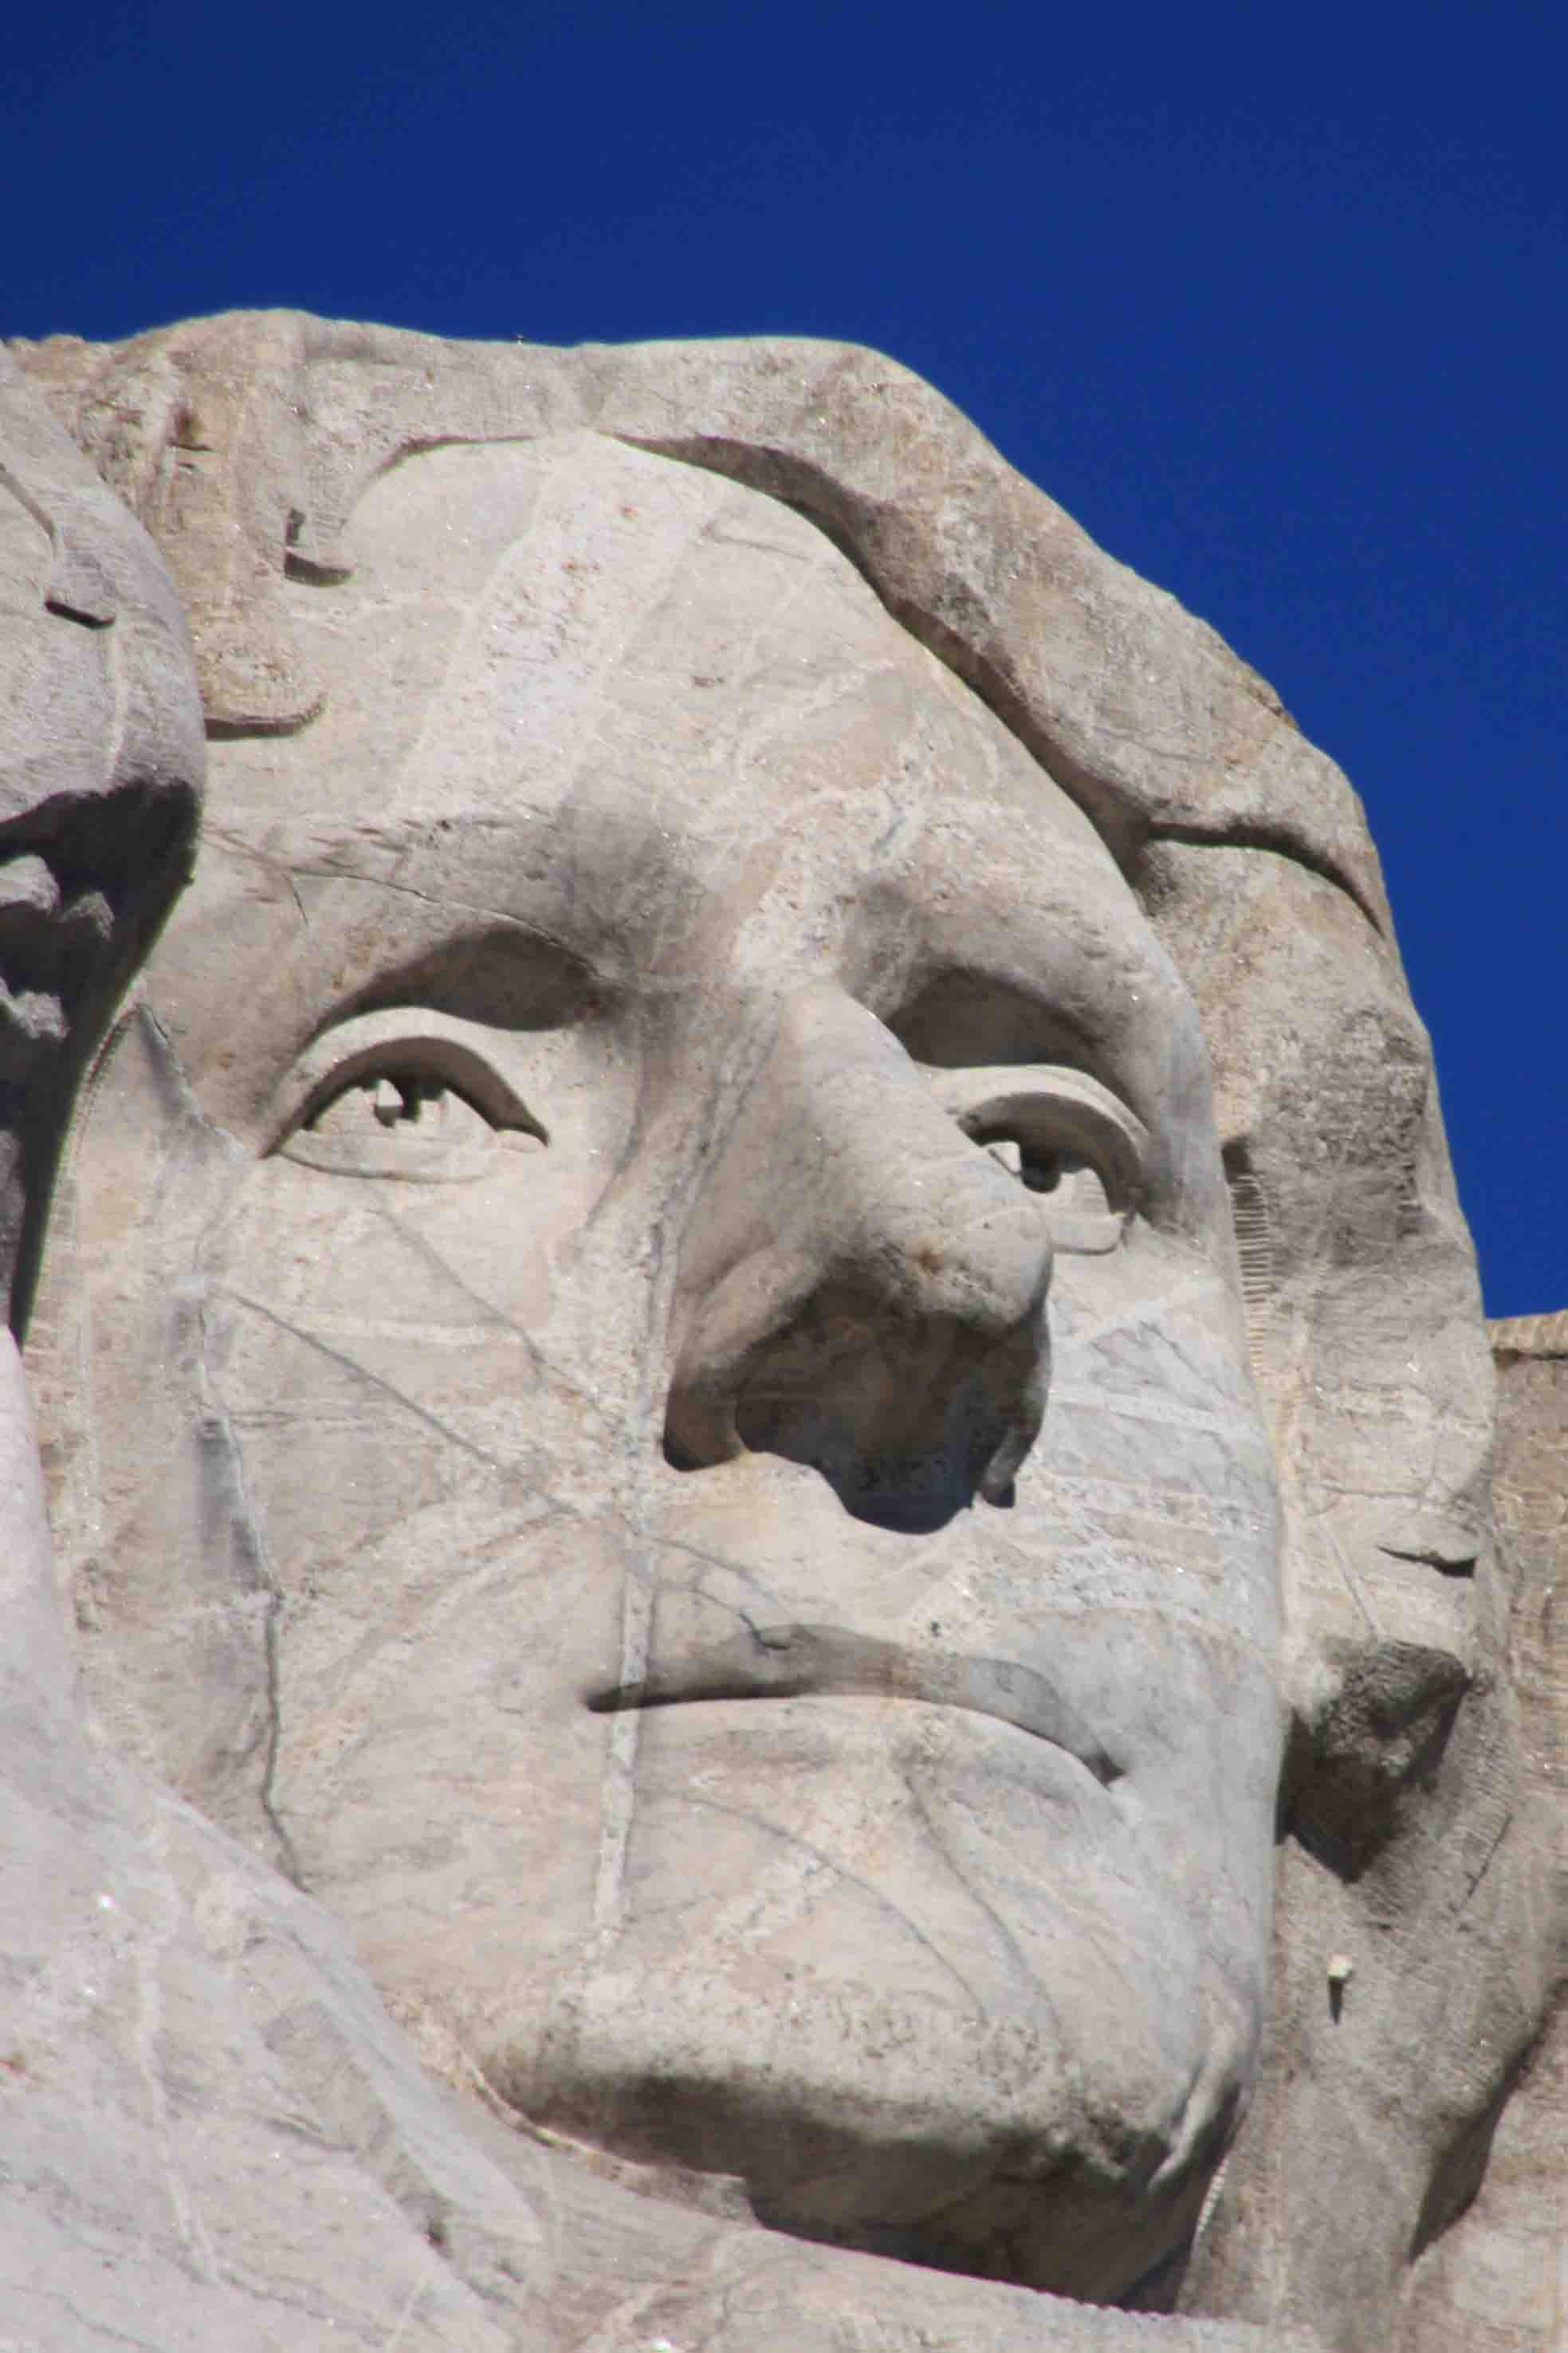 Mount Rushmore Etb Travel Photography